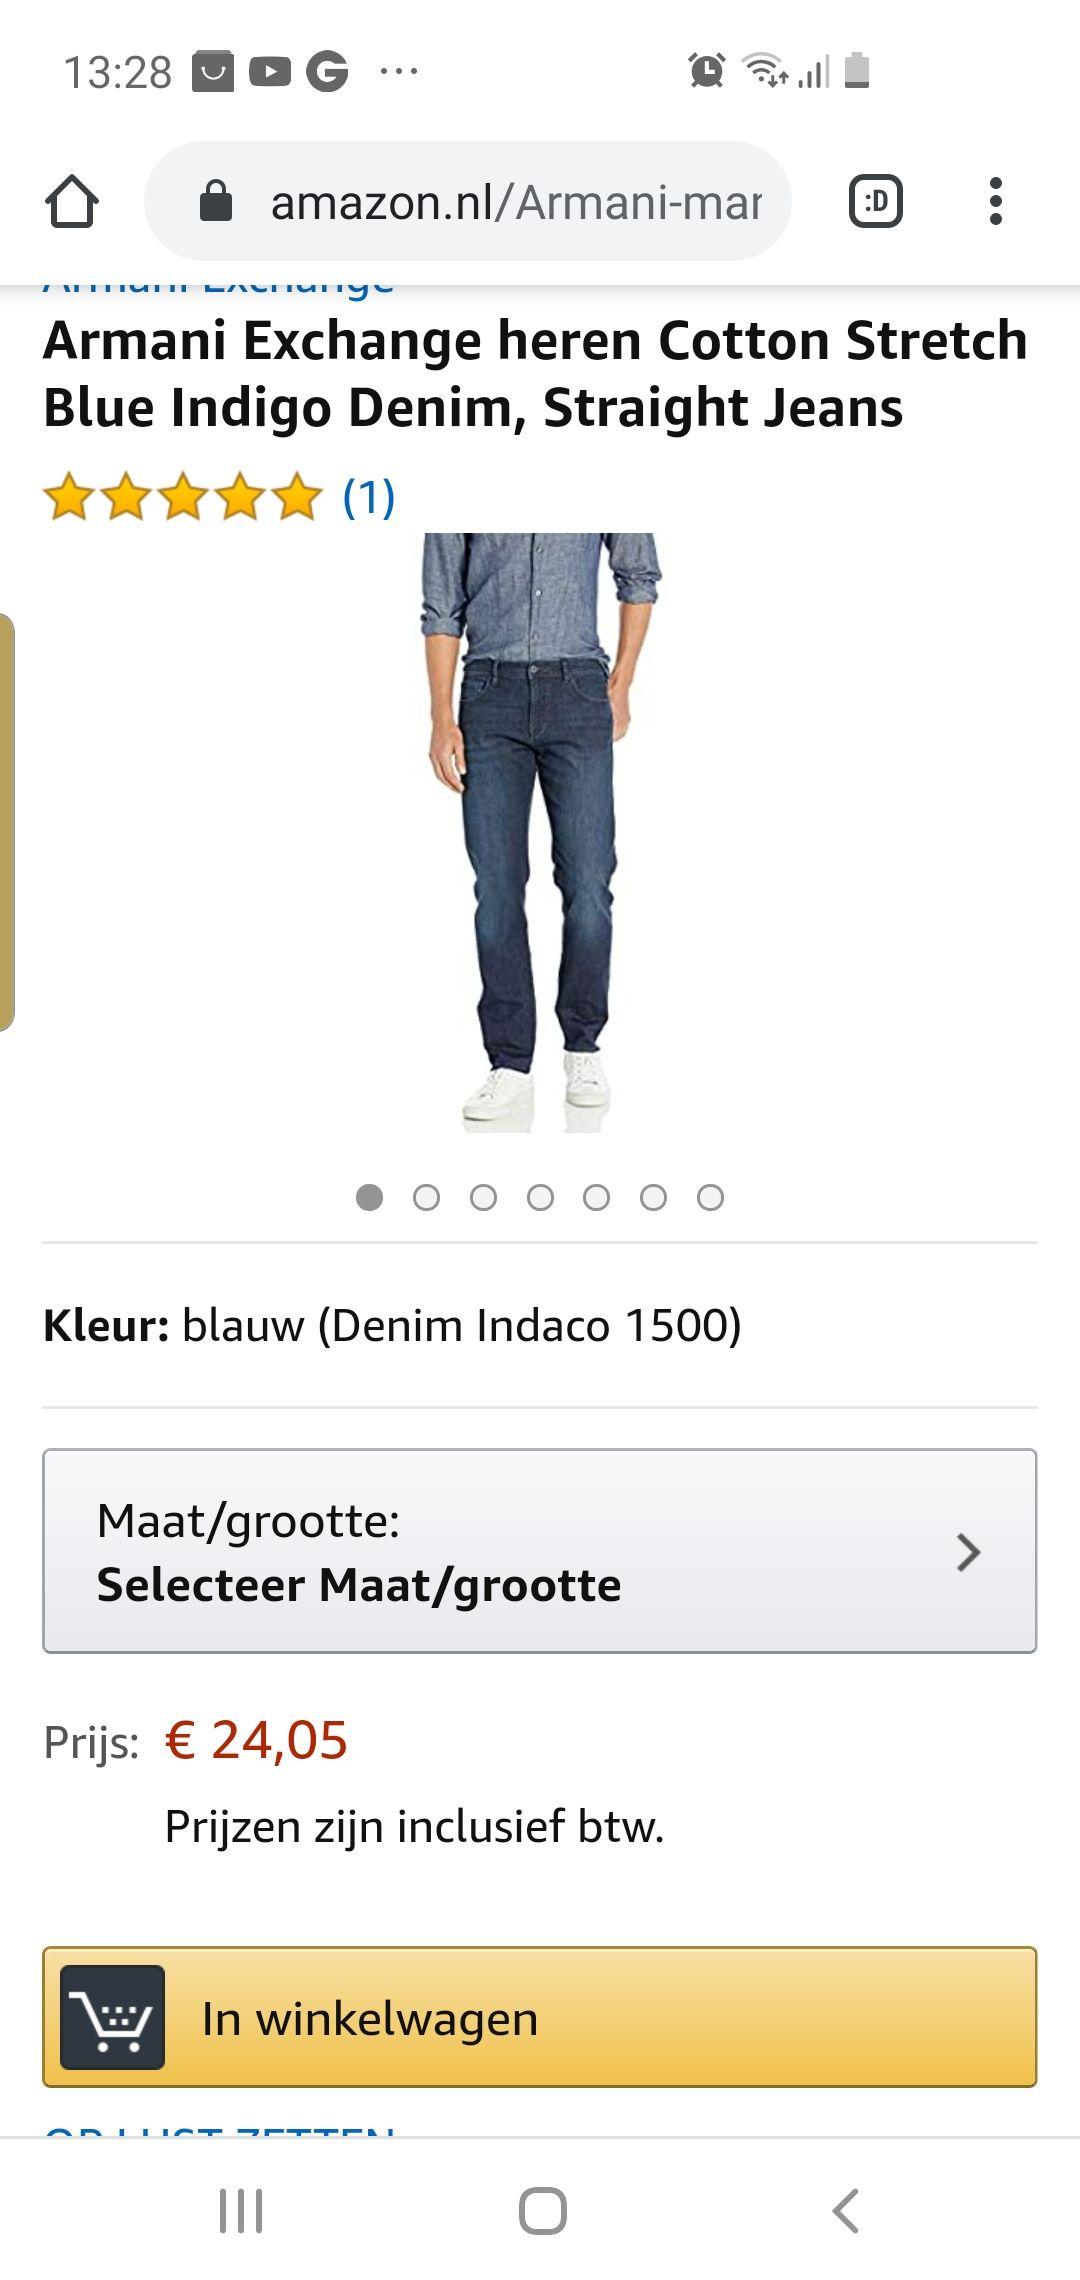 Armani exchange jeans inclusief verzending amazon.nl